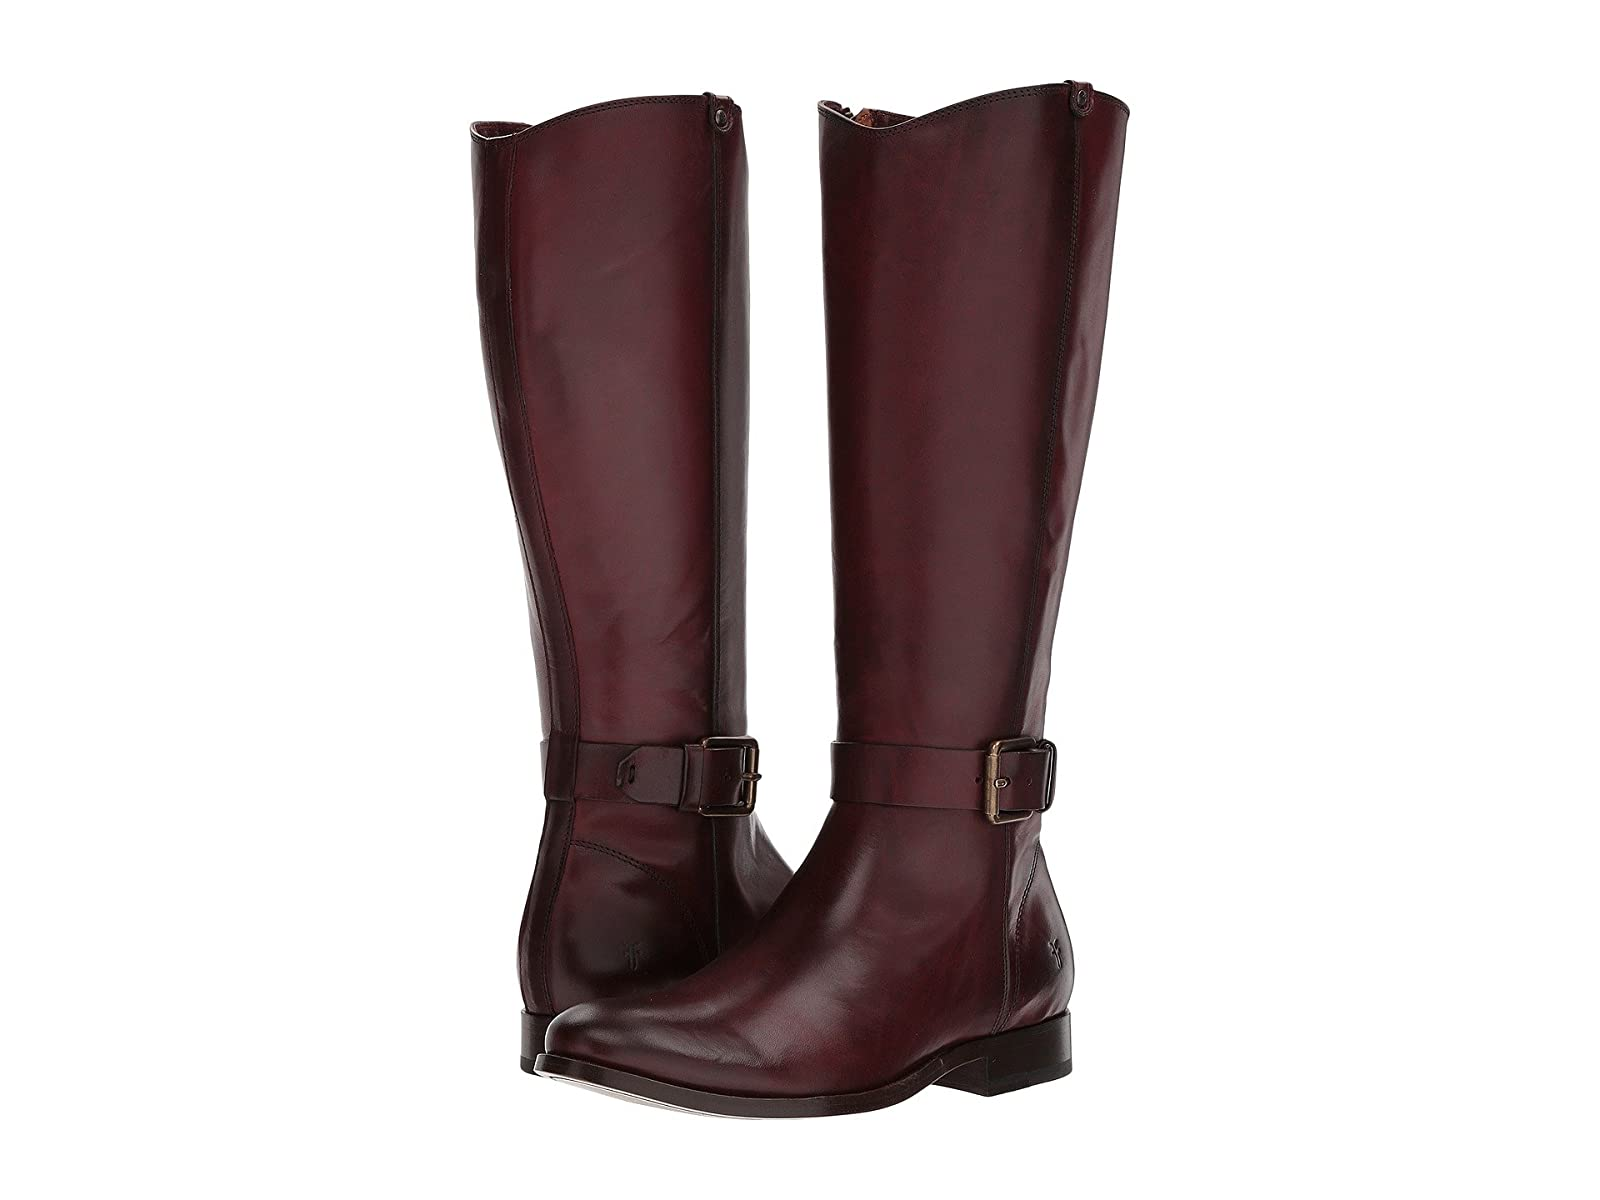 Frye Melissa Strap TallCheap and distinctive eye-catching shoes